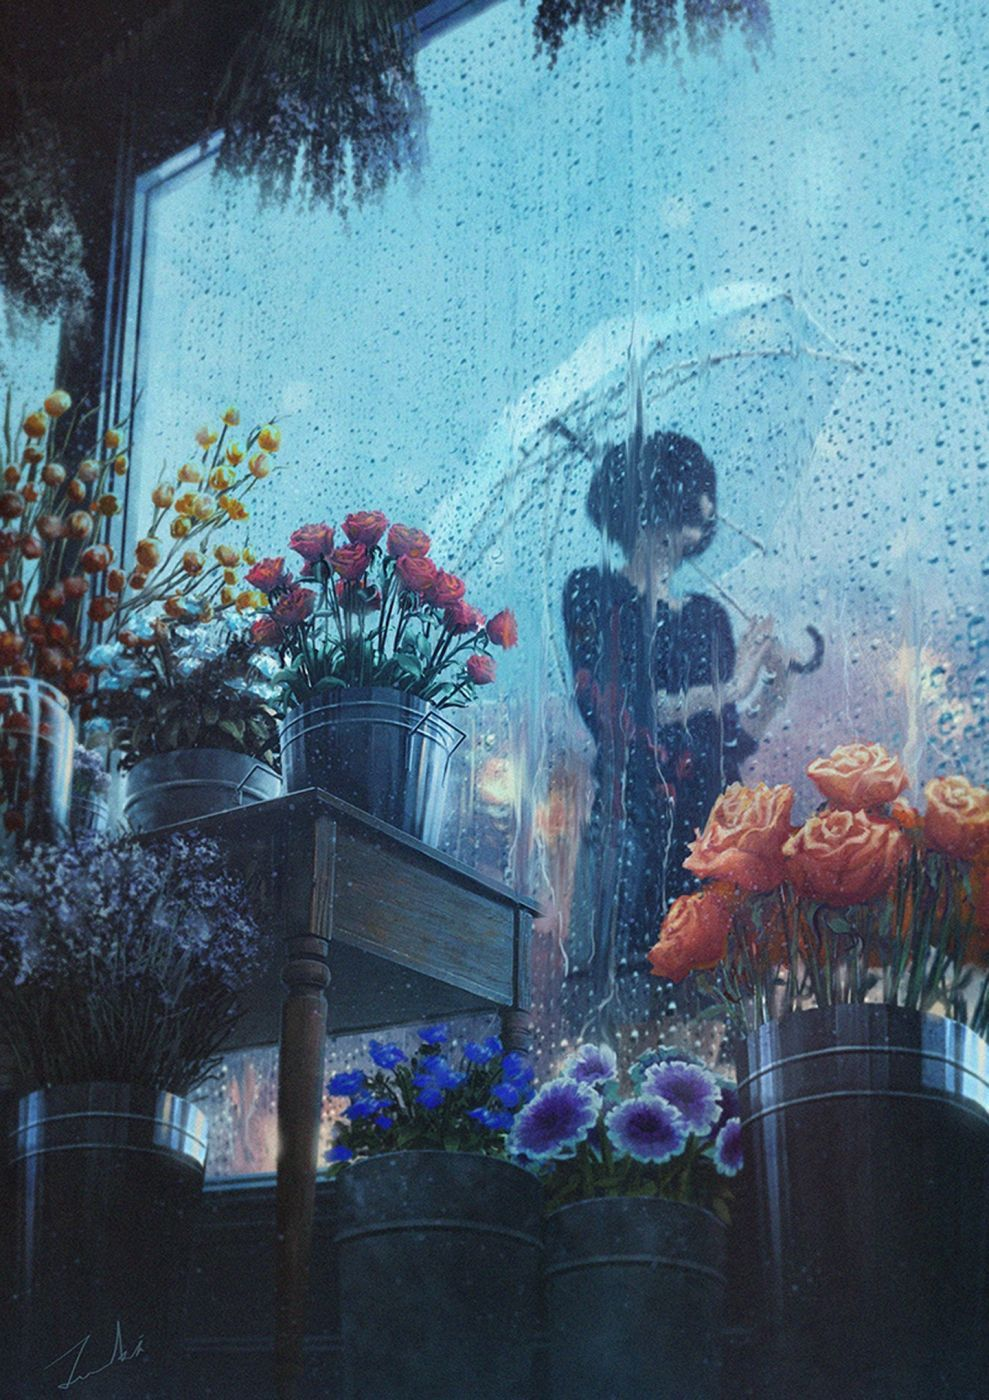 Rain Night Iphone Wallpaper Rain Rain Wallpapers Rainy Wallpaper